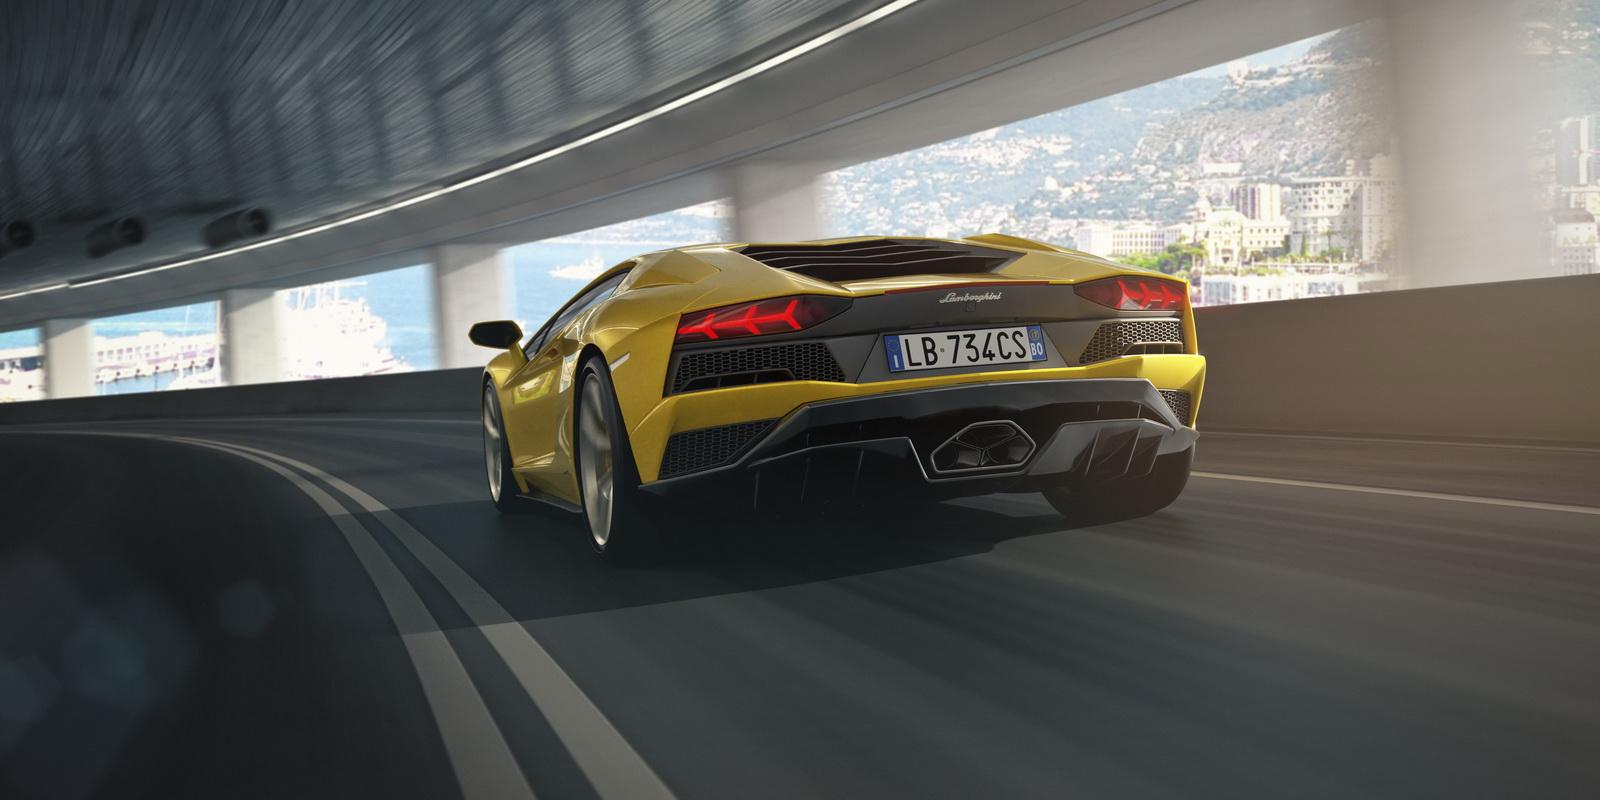 Lamborghini-Aventador-S-Coupé-8